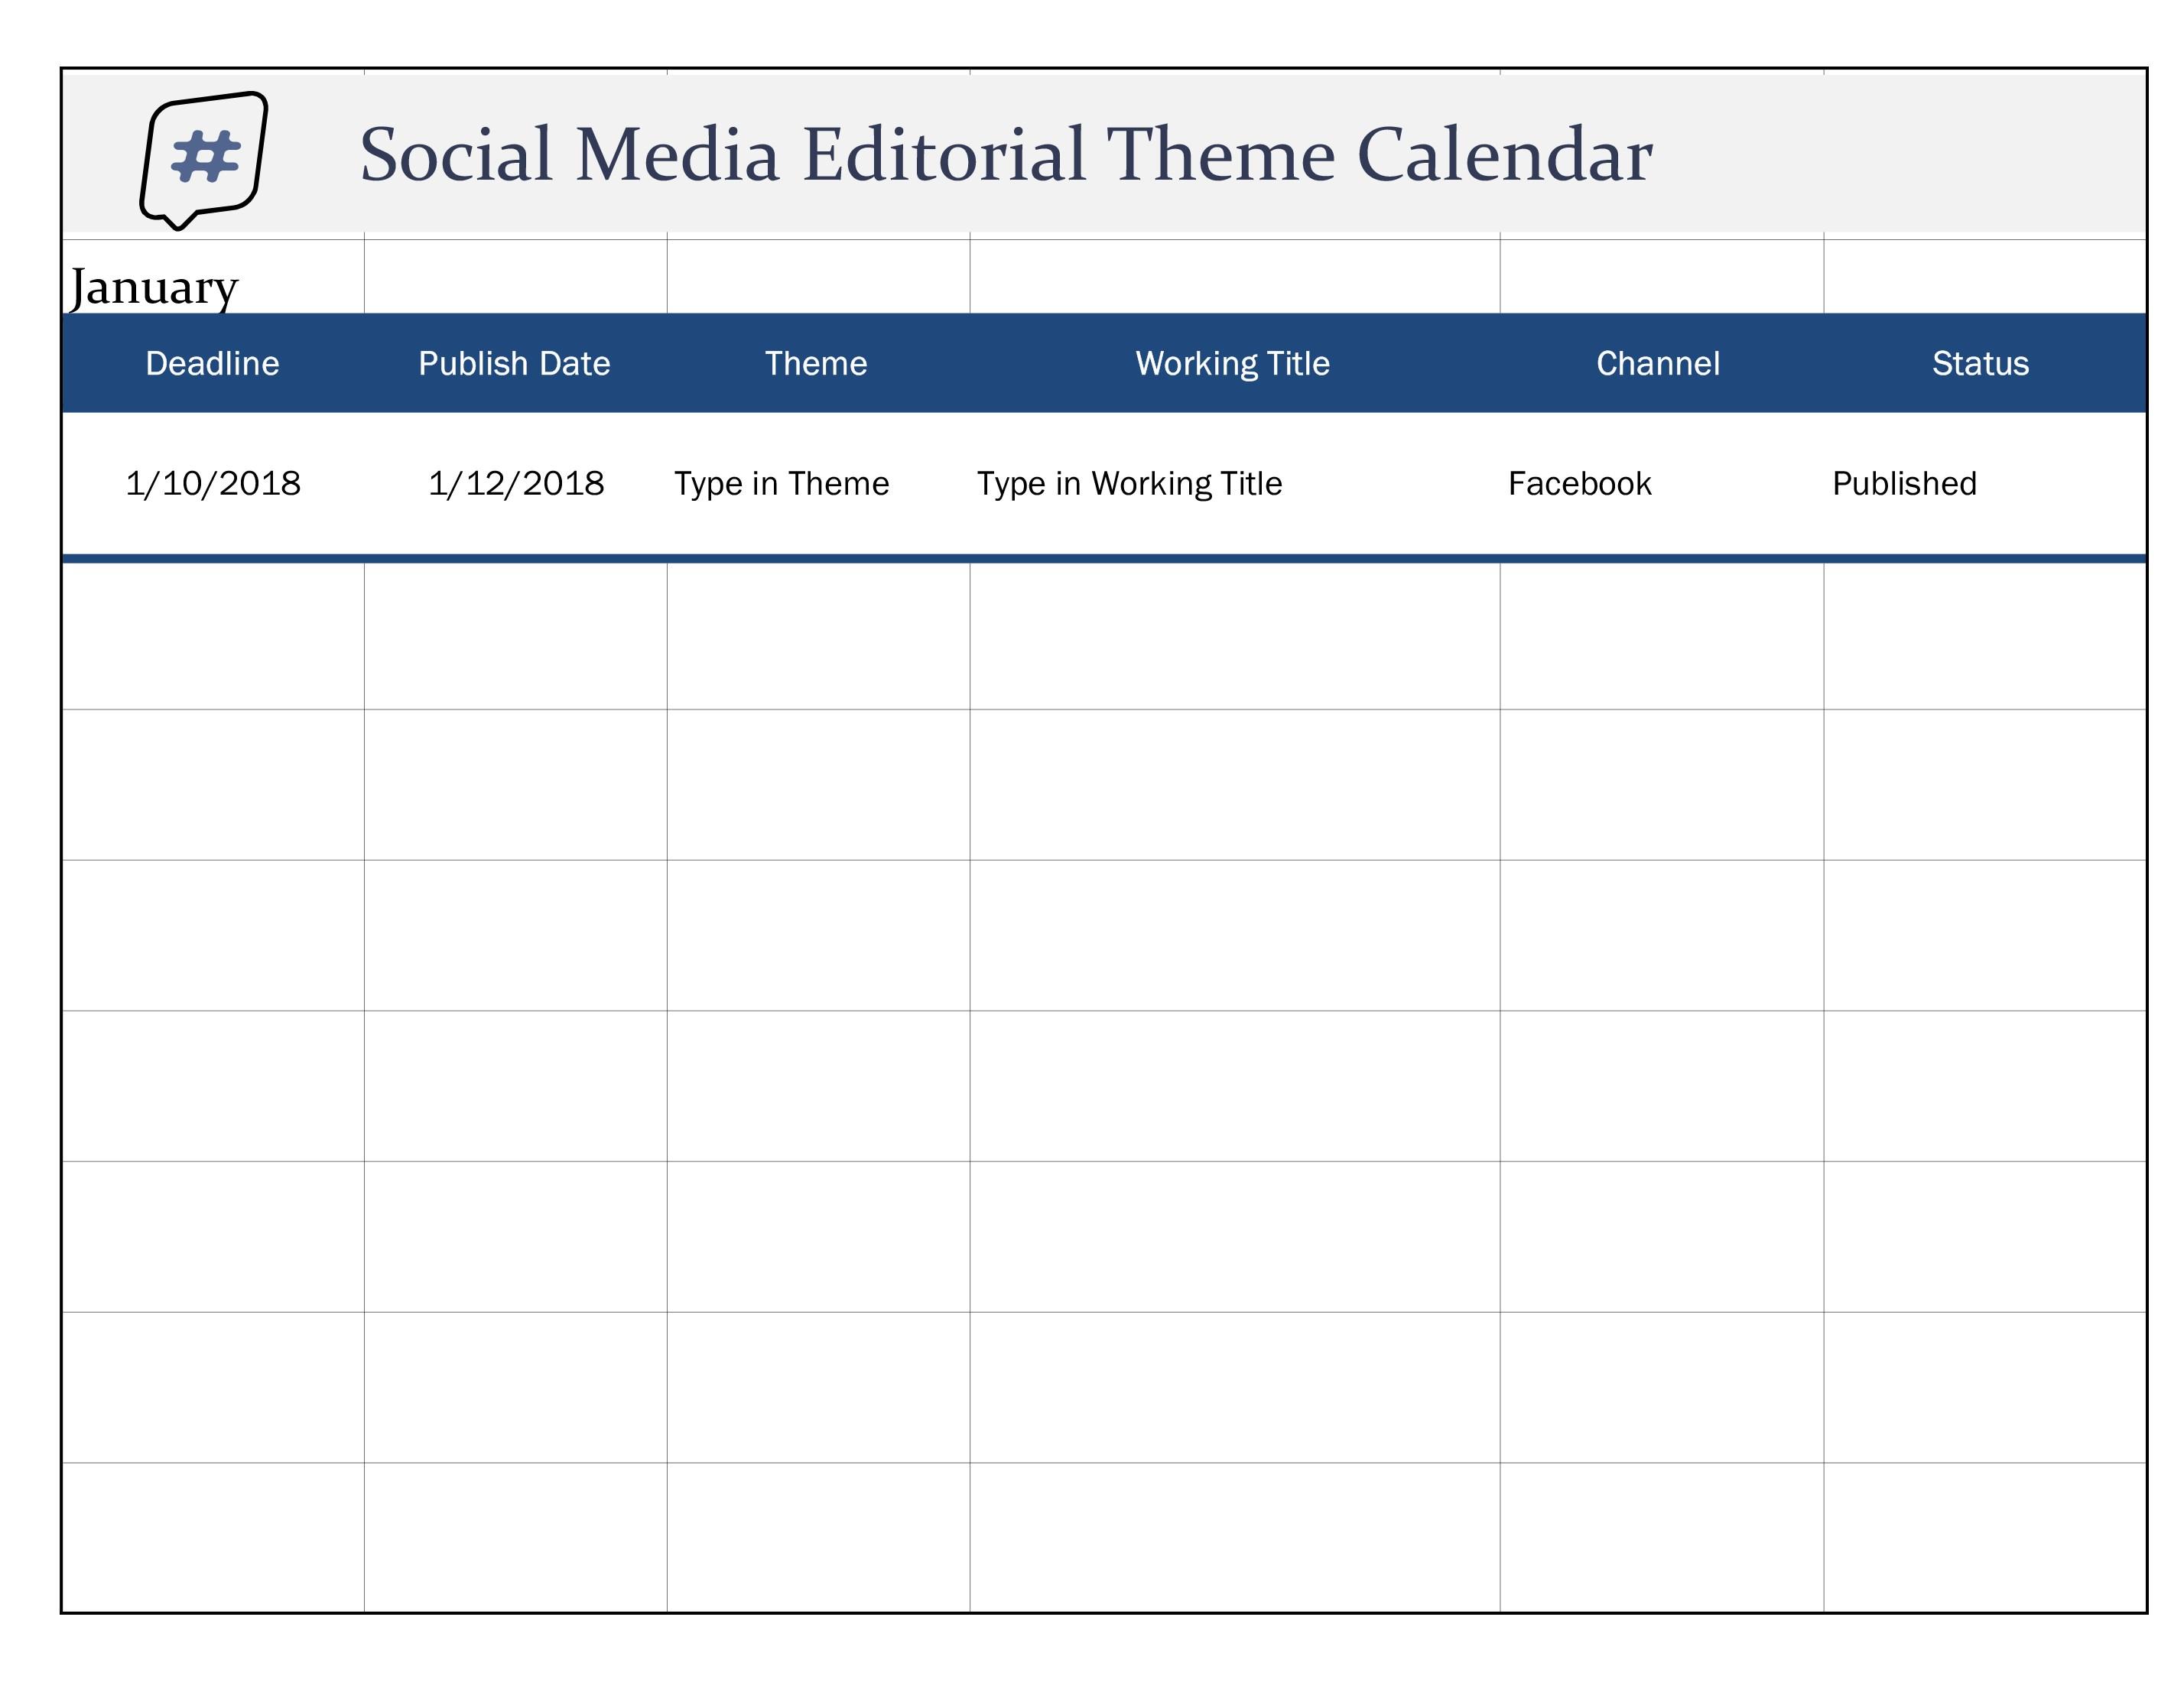 Social Media Editorial Theme Calendar with Social Media Calendar Template